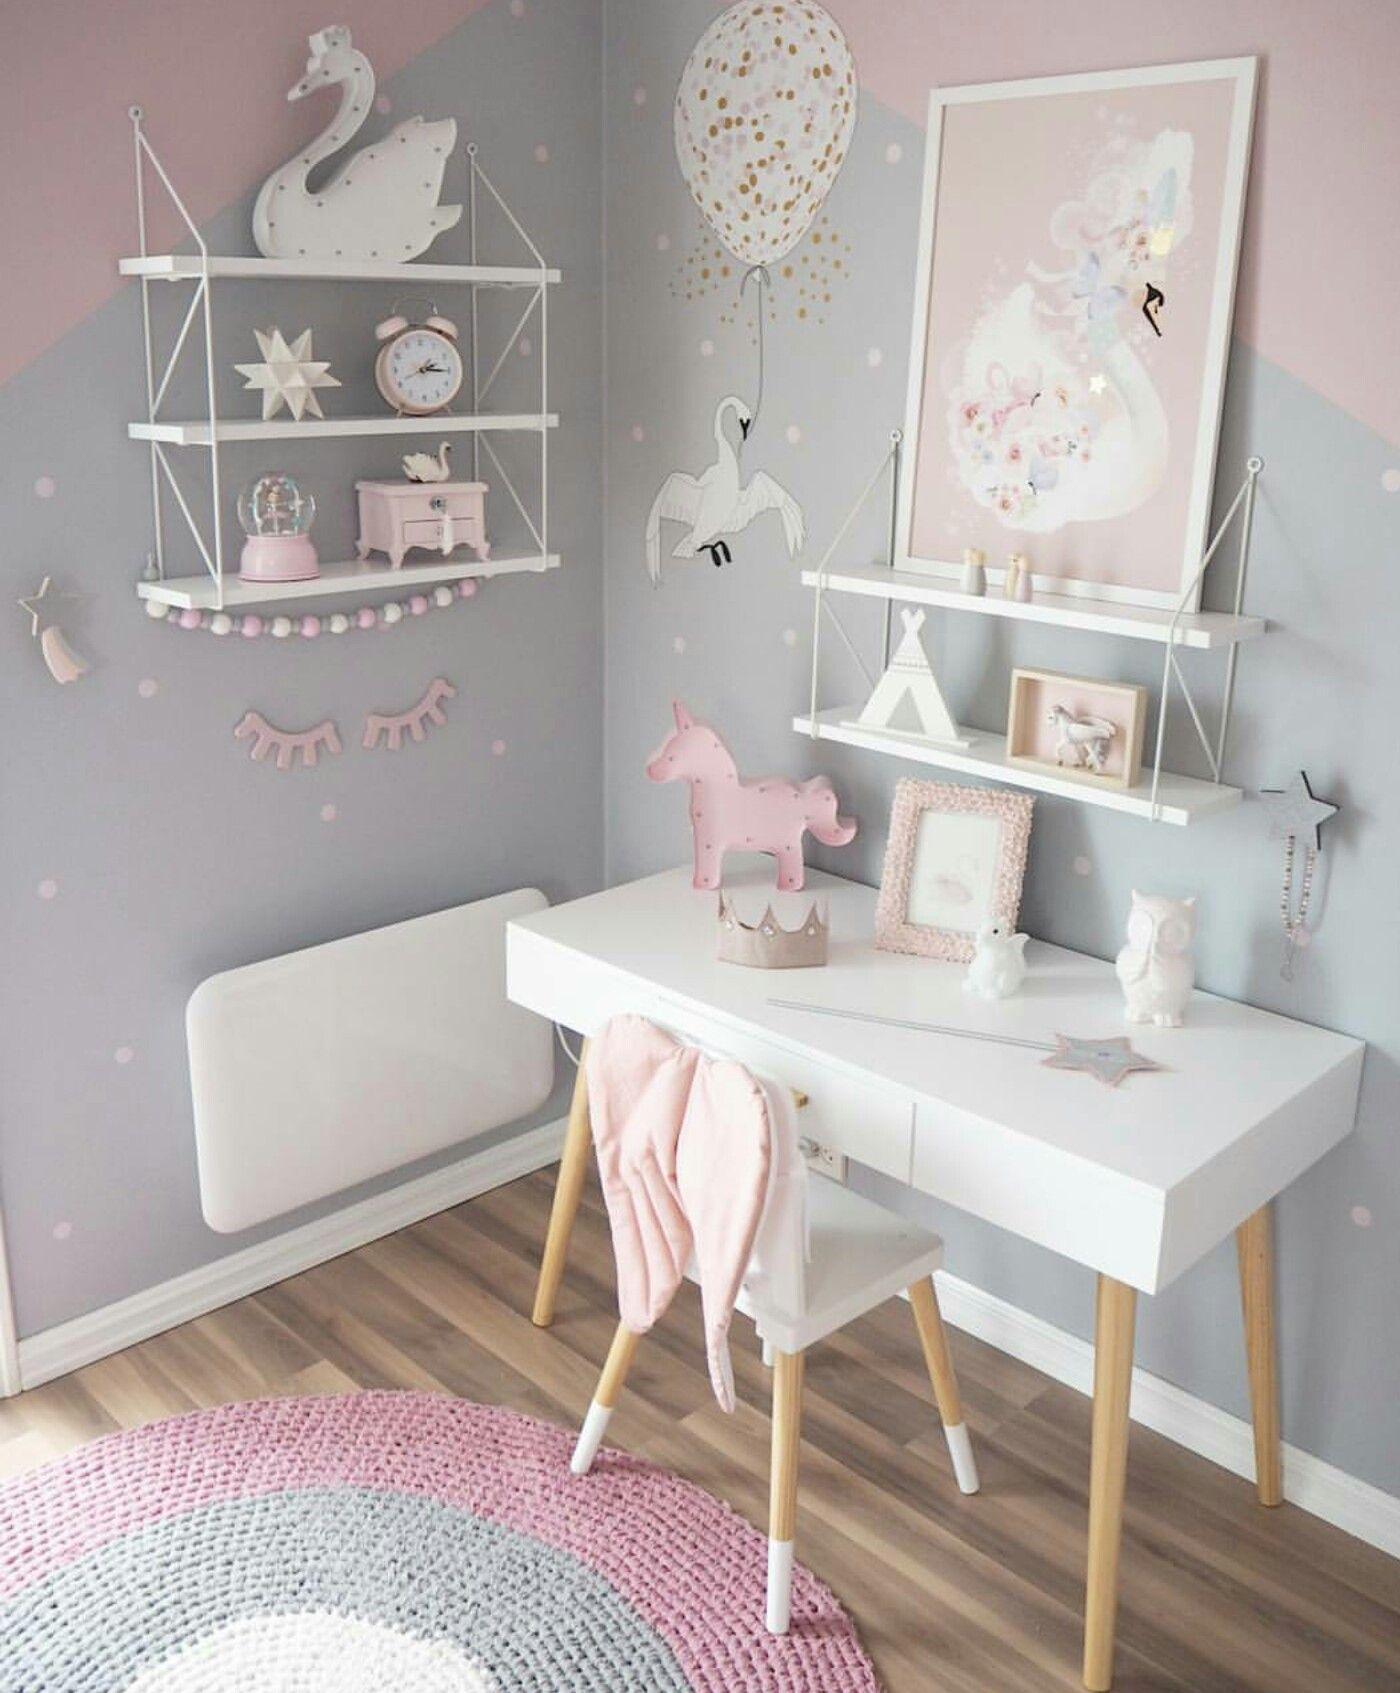 Pin di L u n a su B e d r o o m | Pinterest | Idee cameretta neonato ...